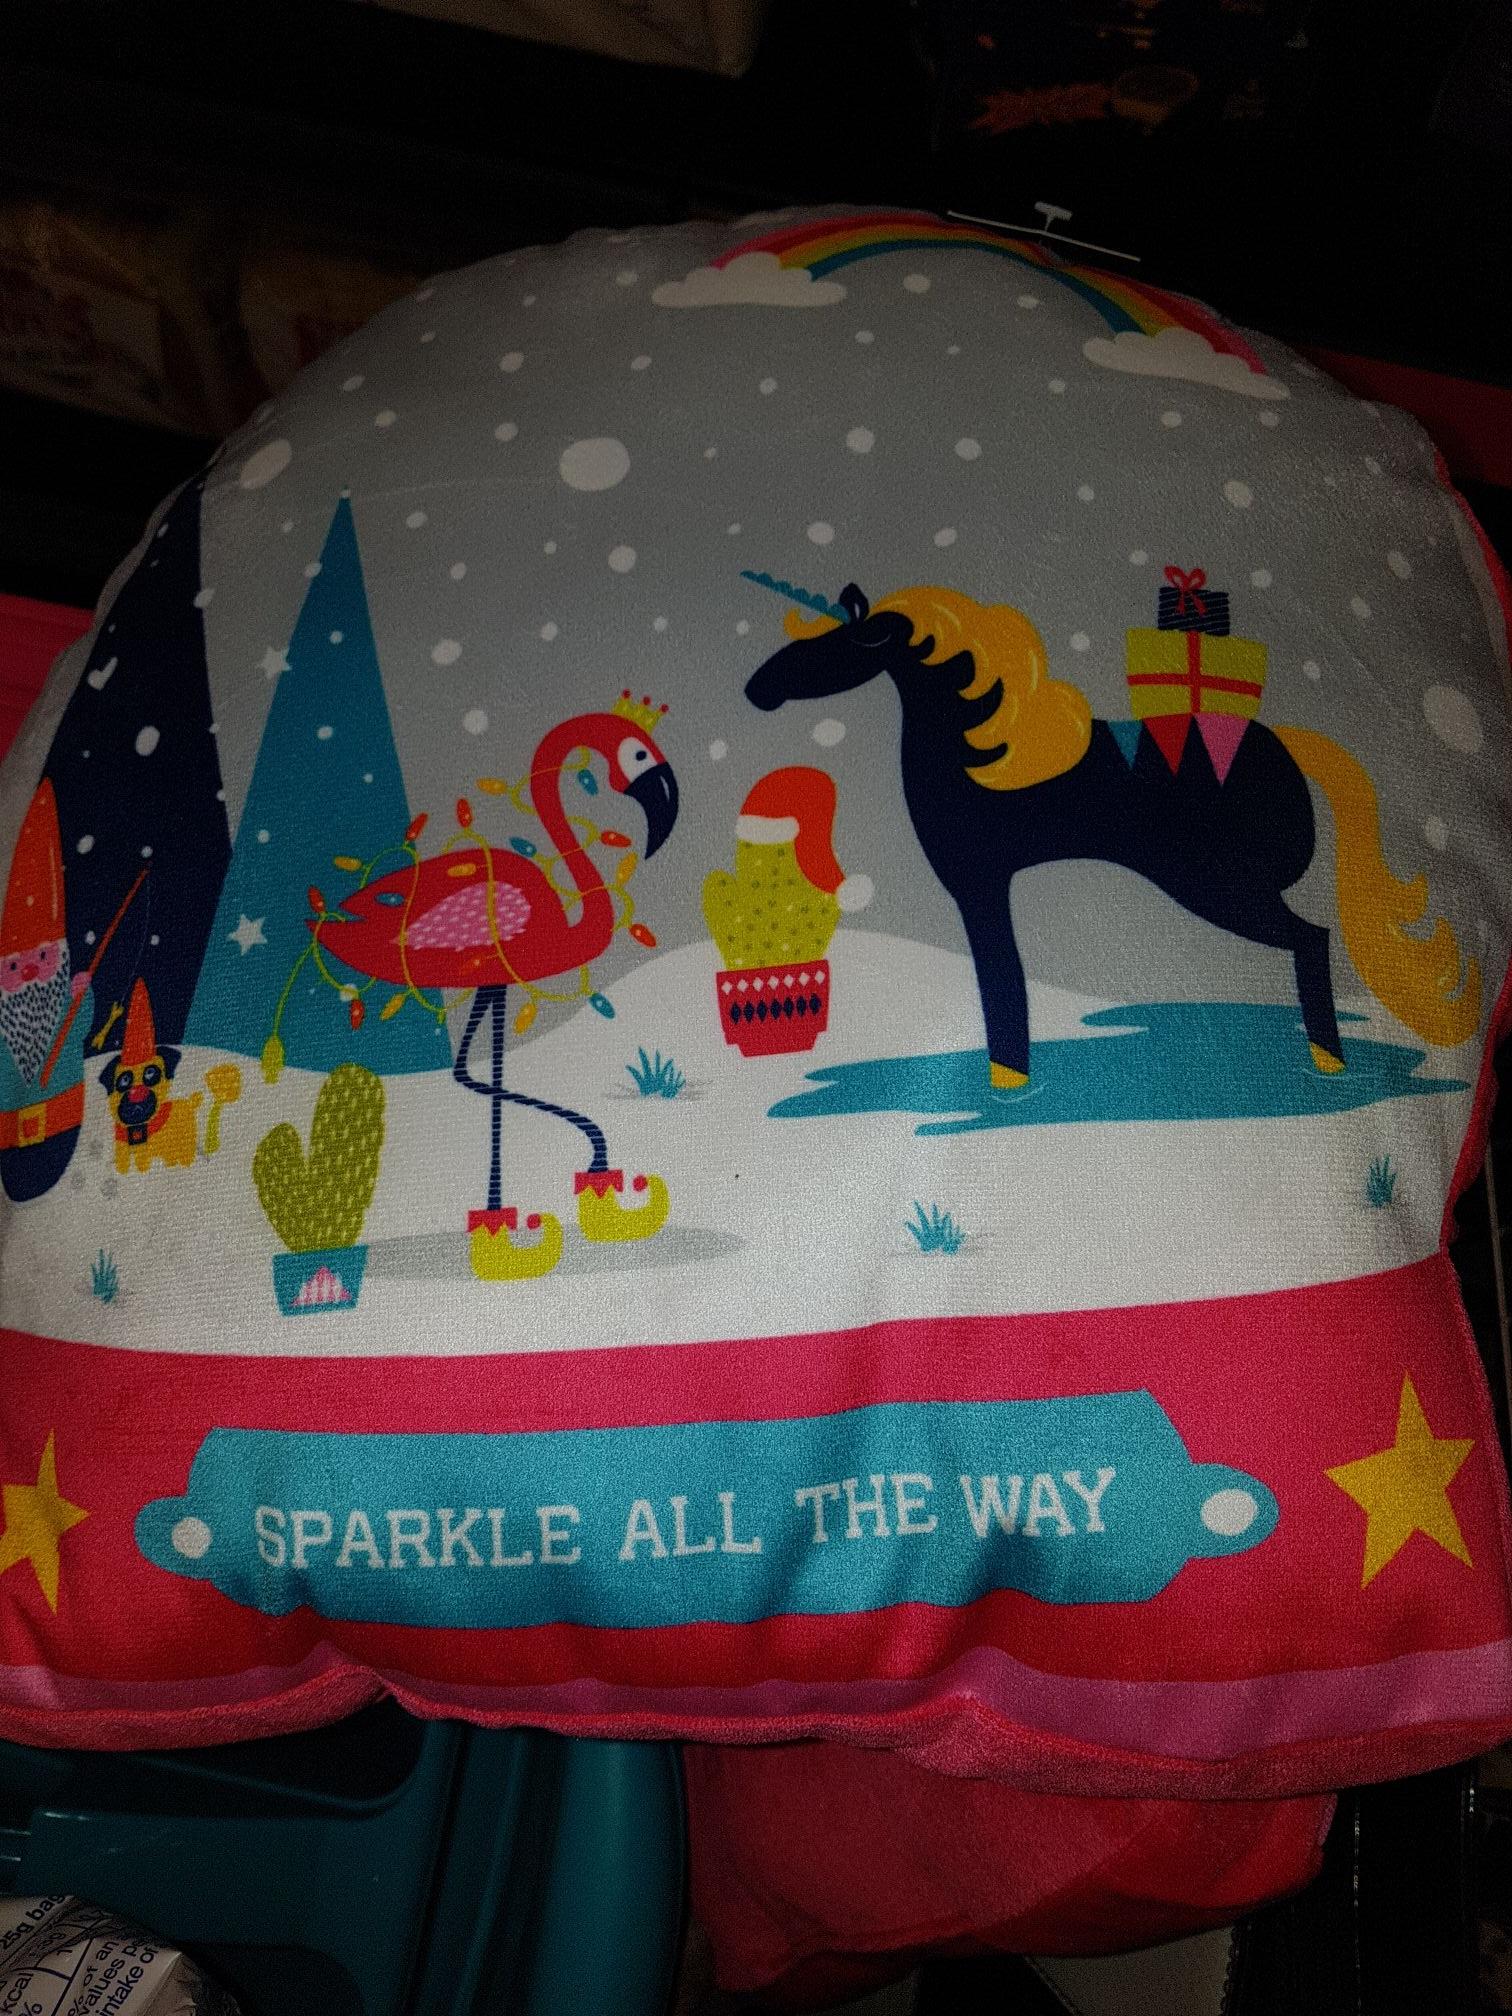 Kids cushions 50p asda instore (Hunts Cross)